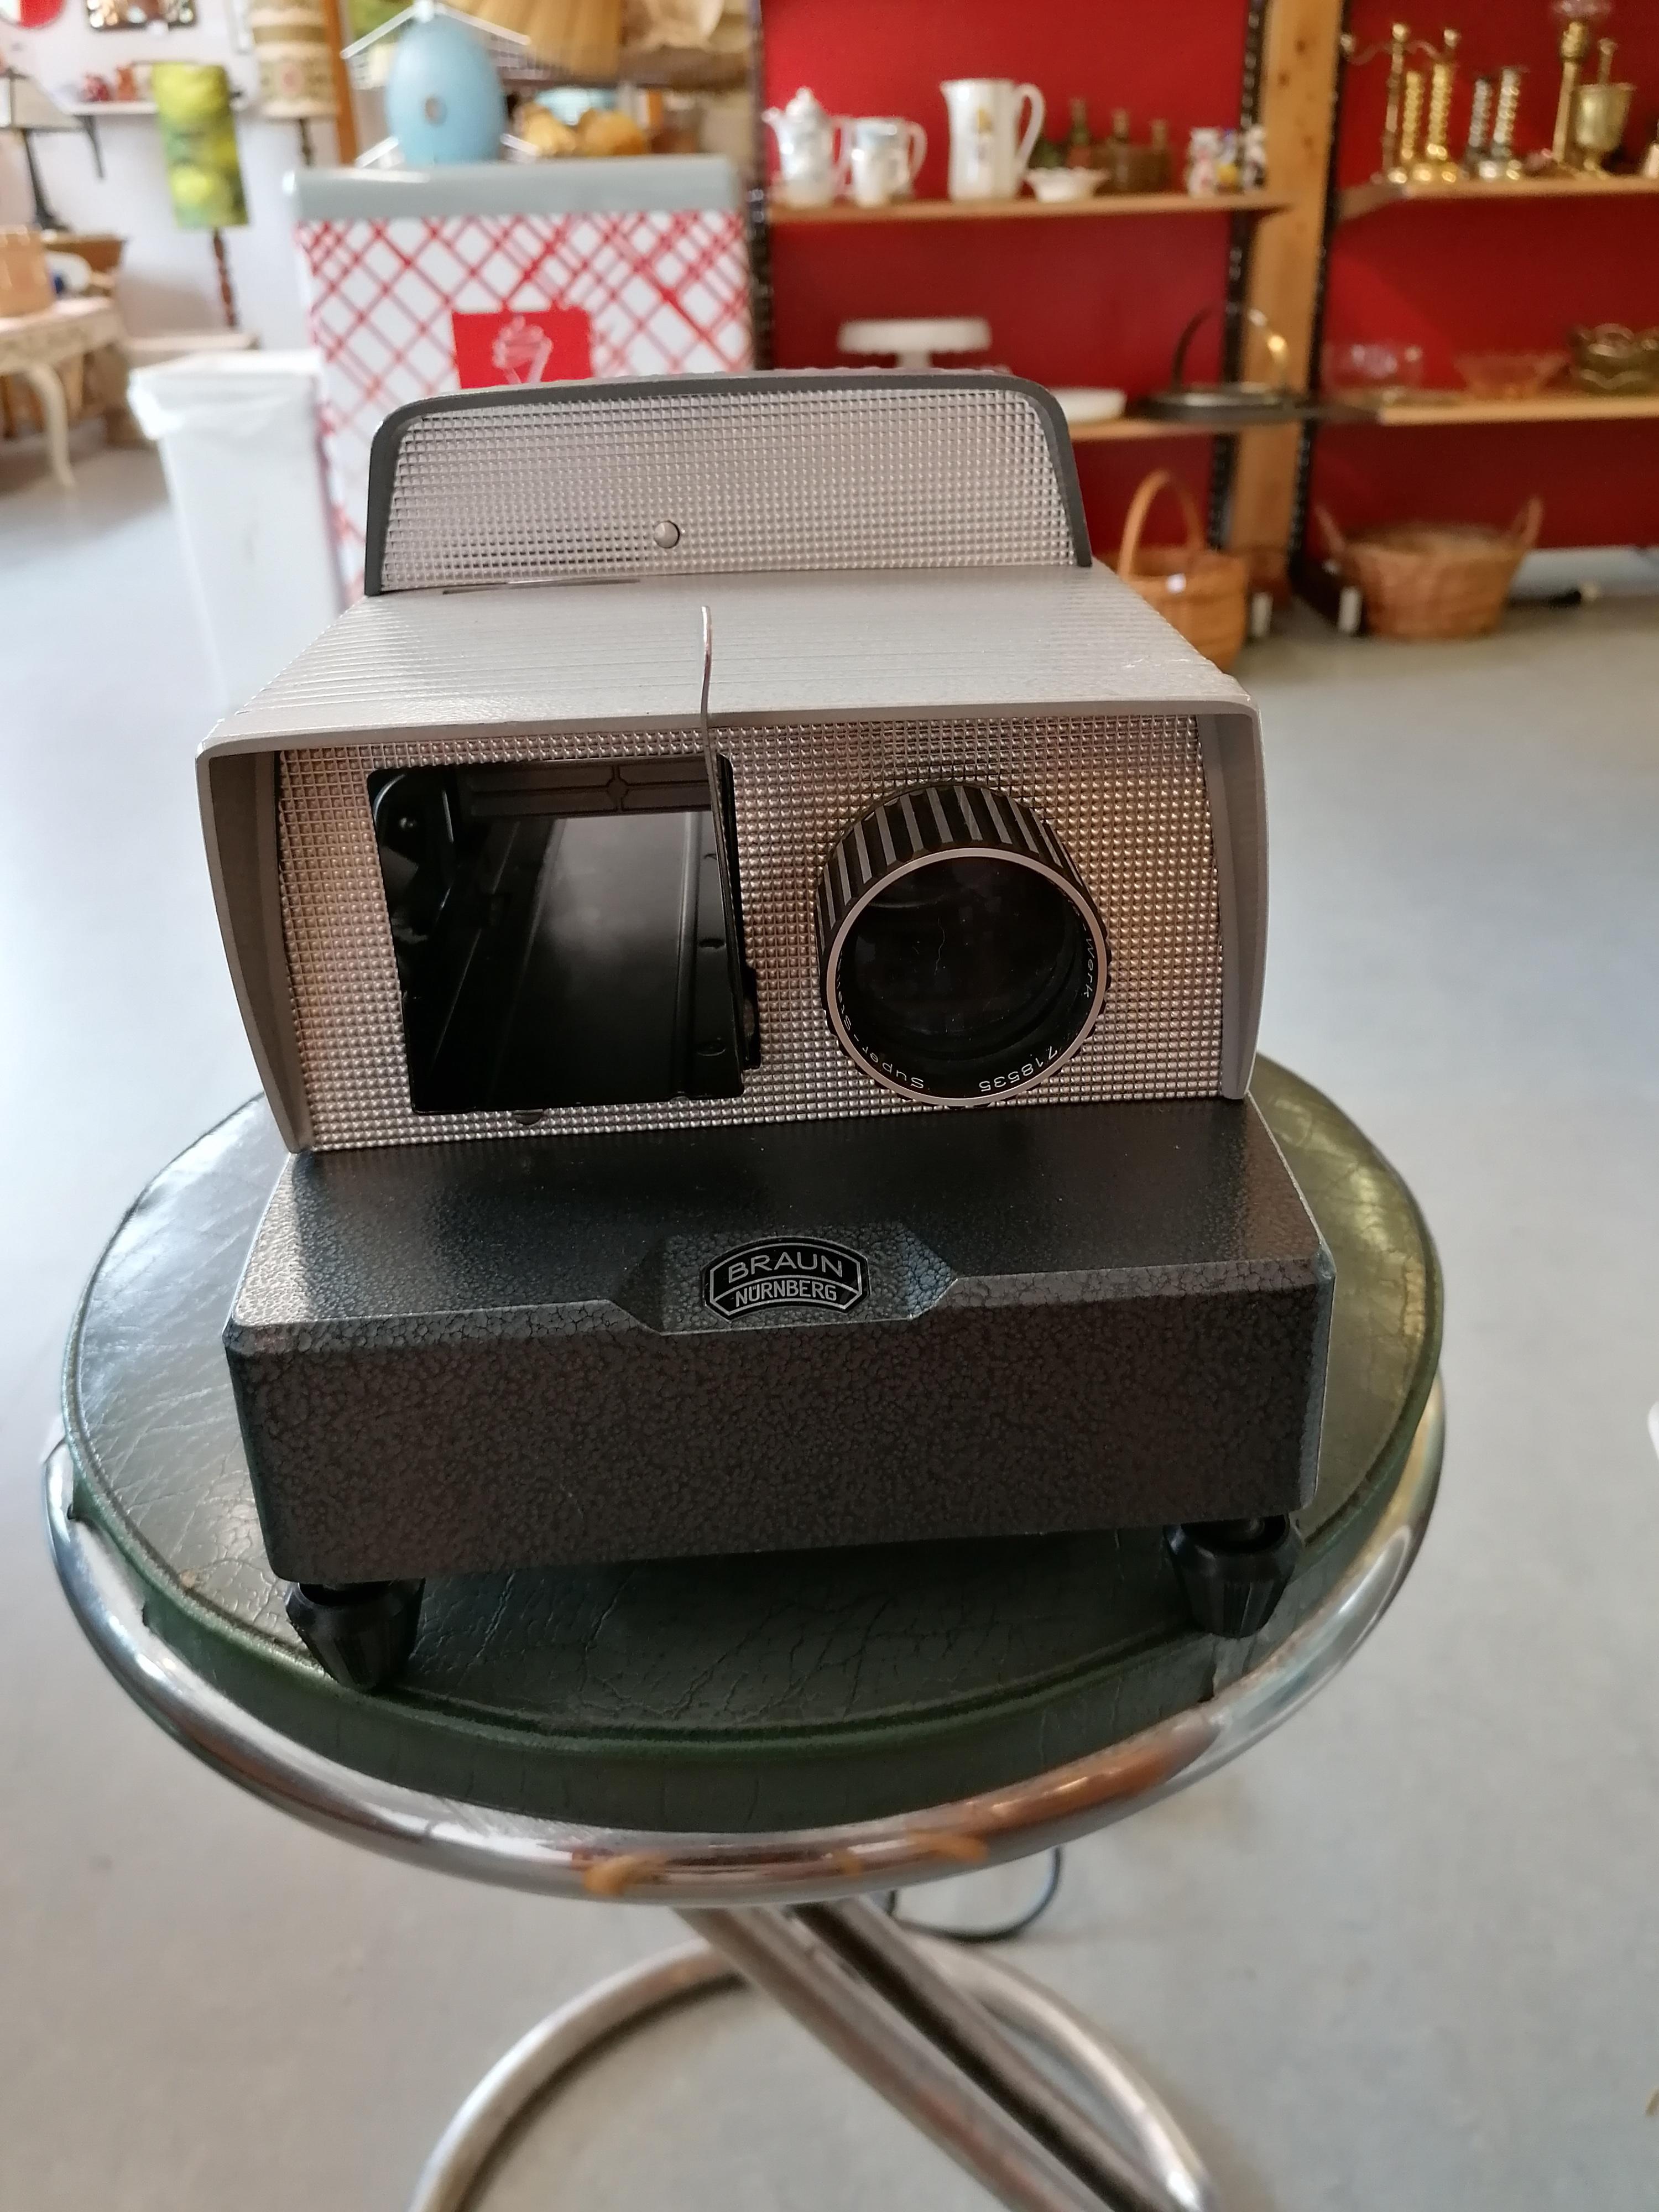 Diabildsapparat Braun Nurnberg Paximat electric 50-tal